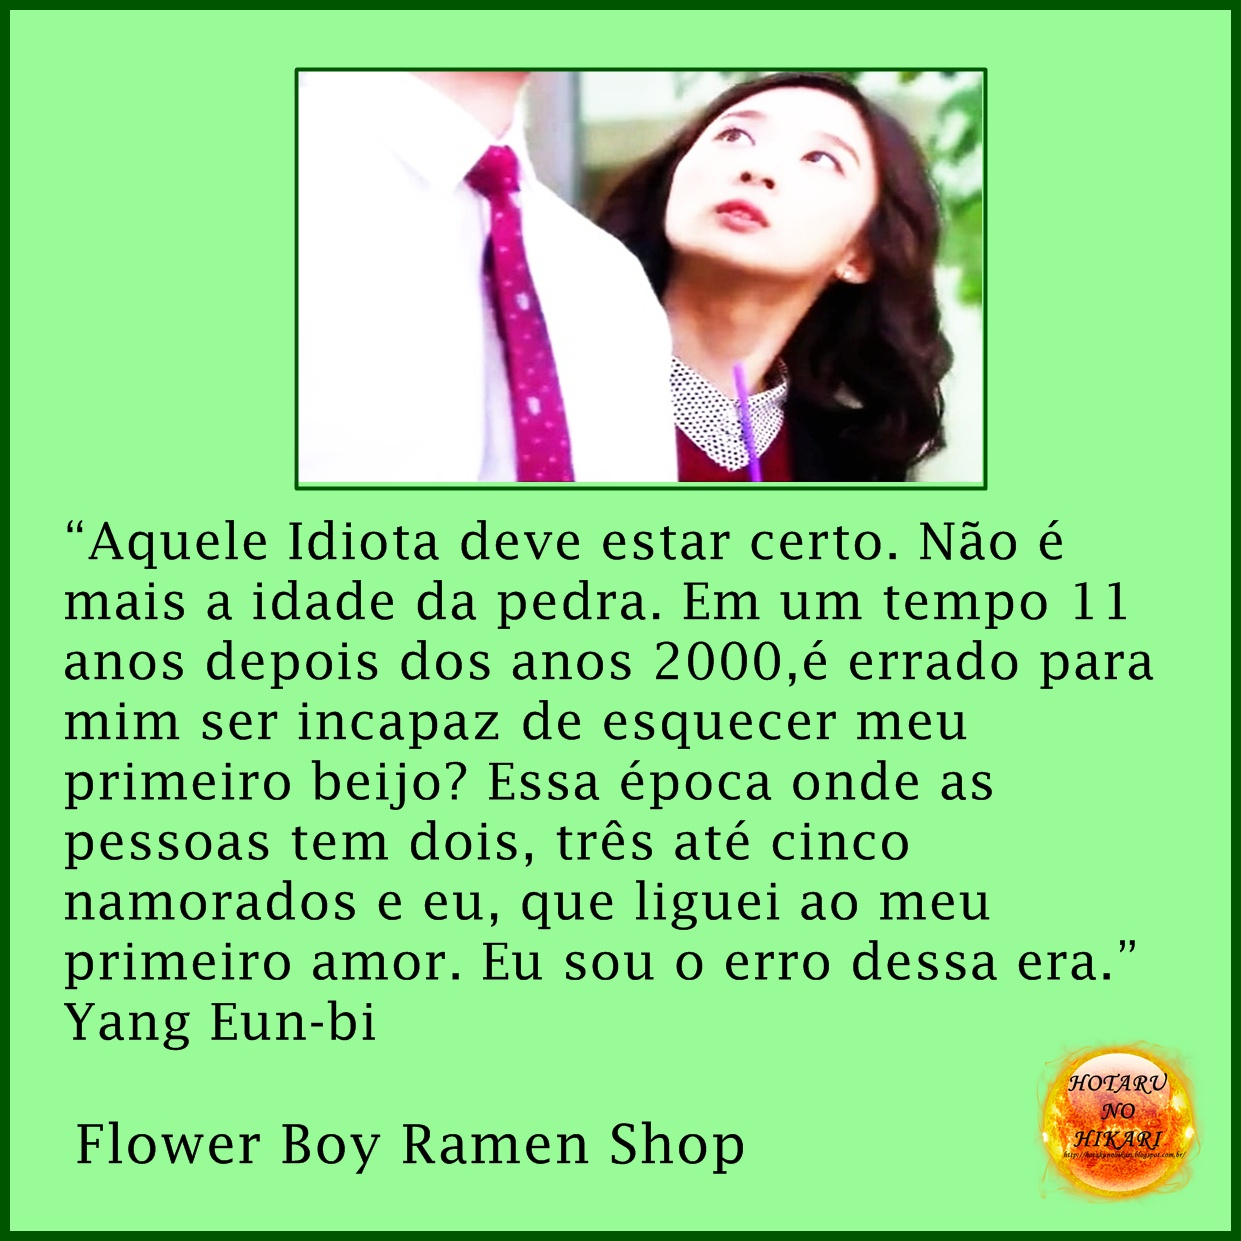 HOTARU NO HIKARI Frases de Flower Boy Ramen Shop 2